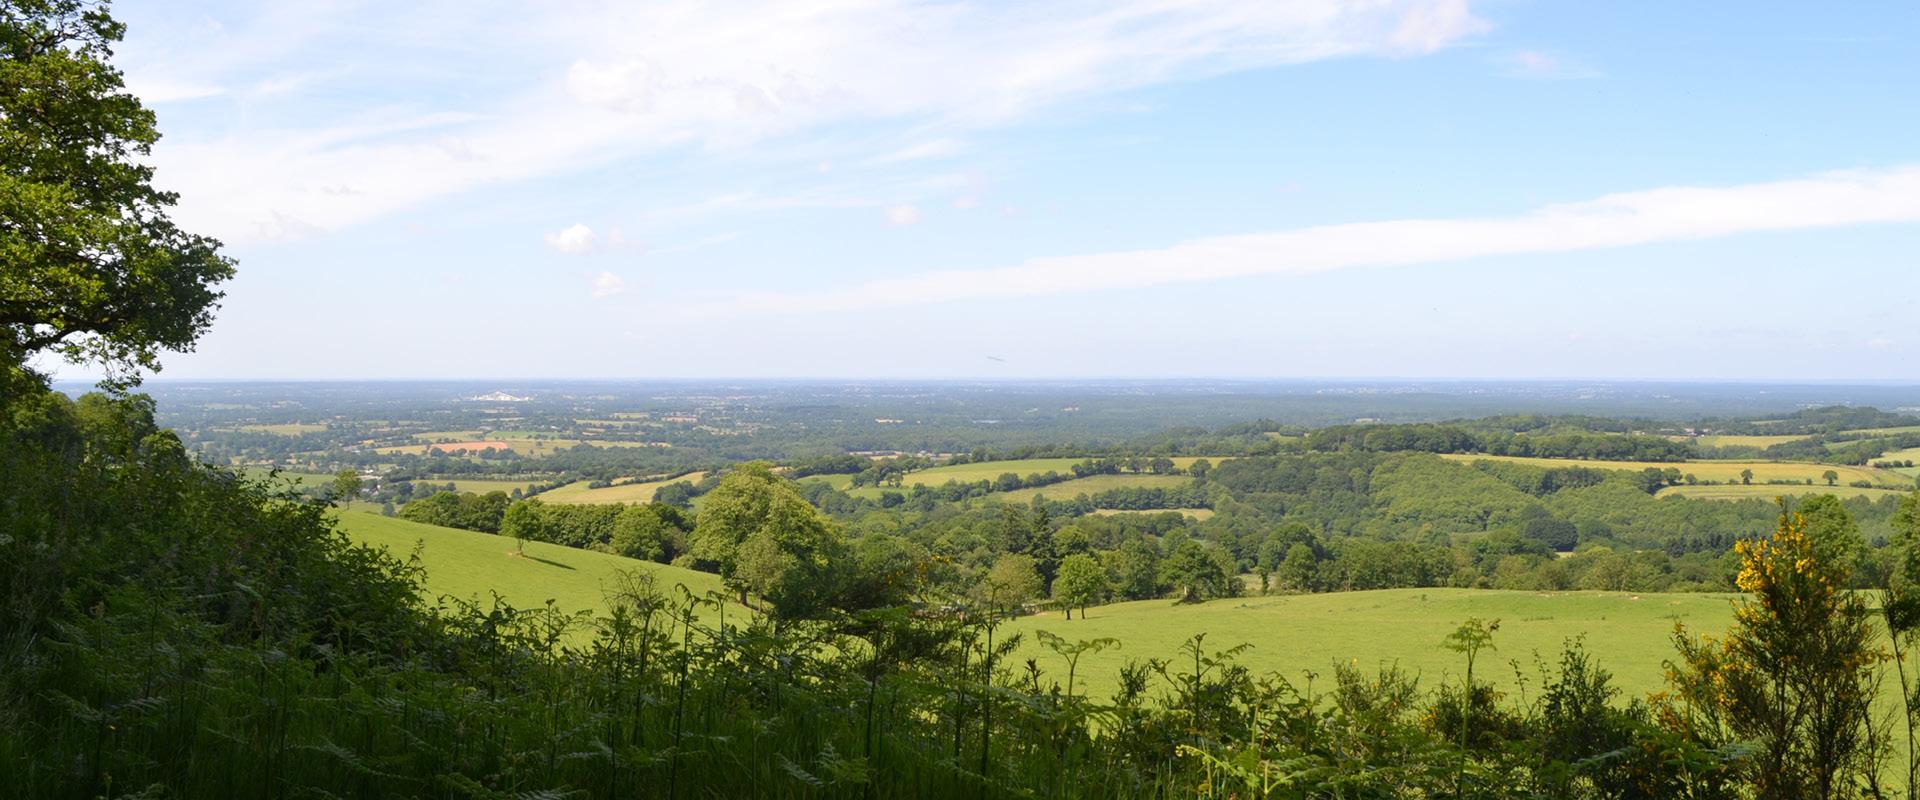 Crêtes d'Hambers en Mayenne